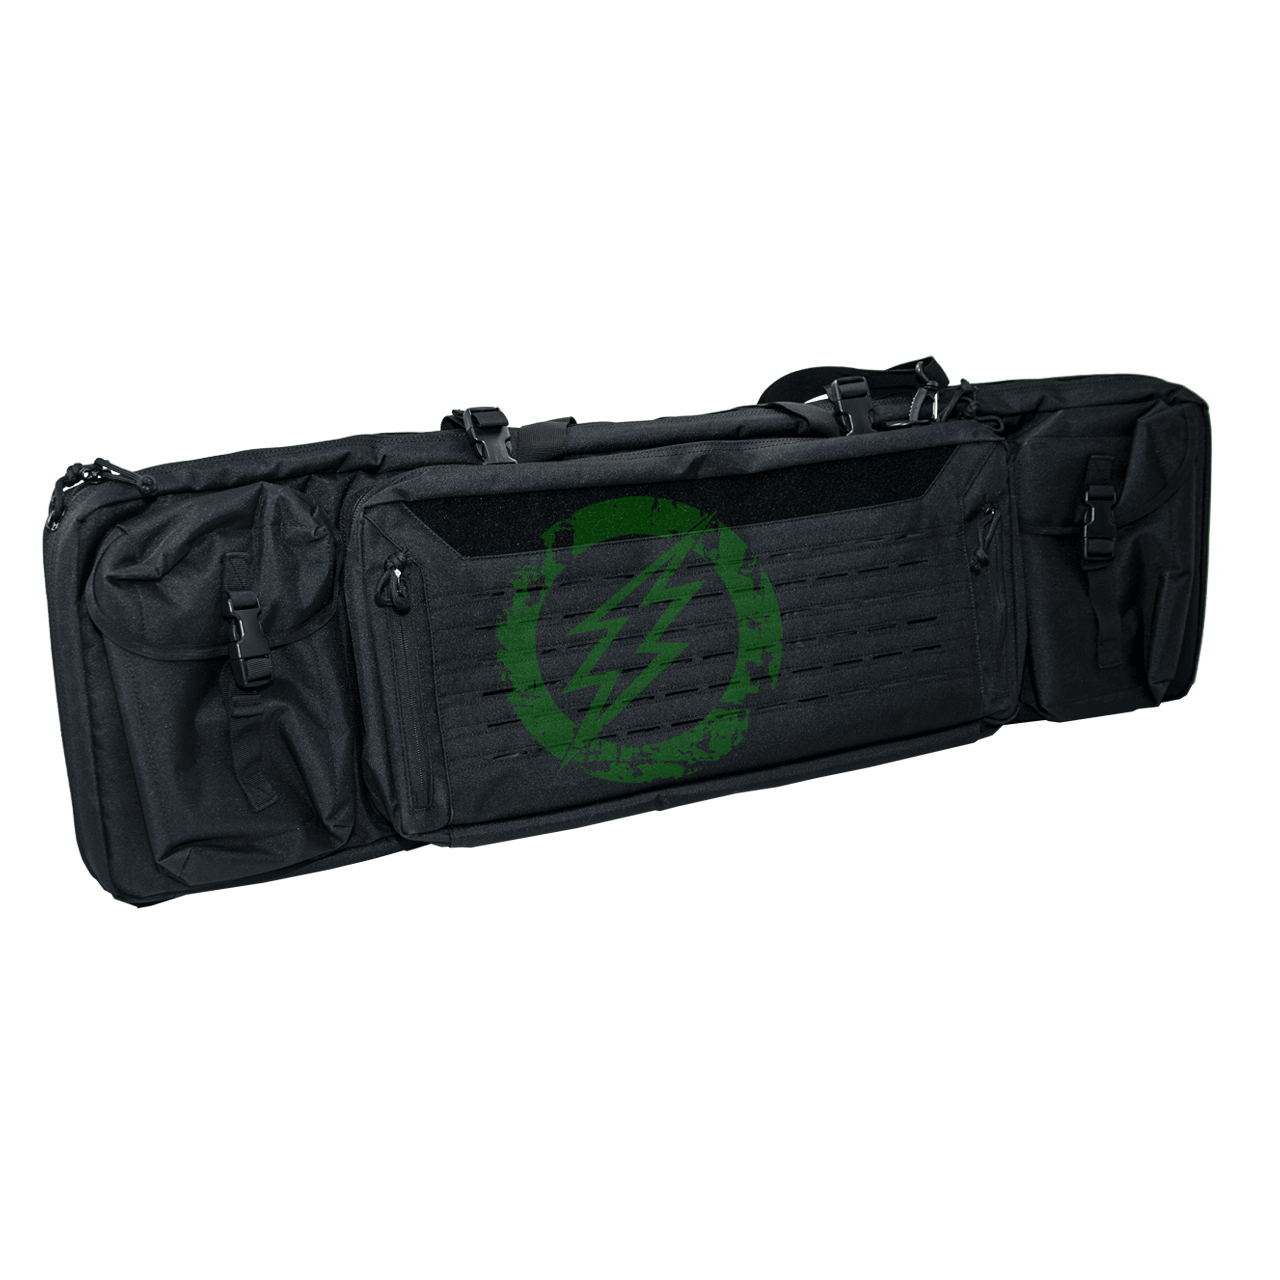 "Guawin Laser Cut 42"" Rifle Bag   Black"